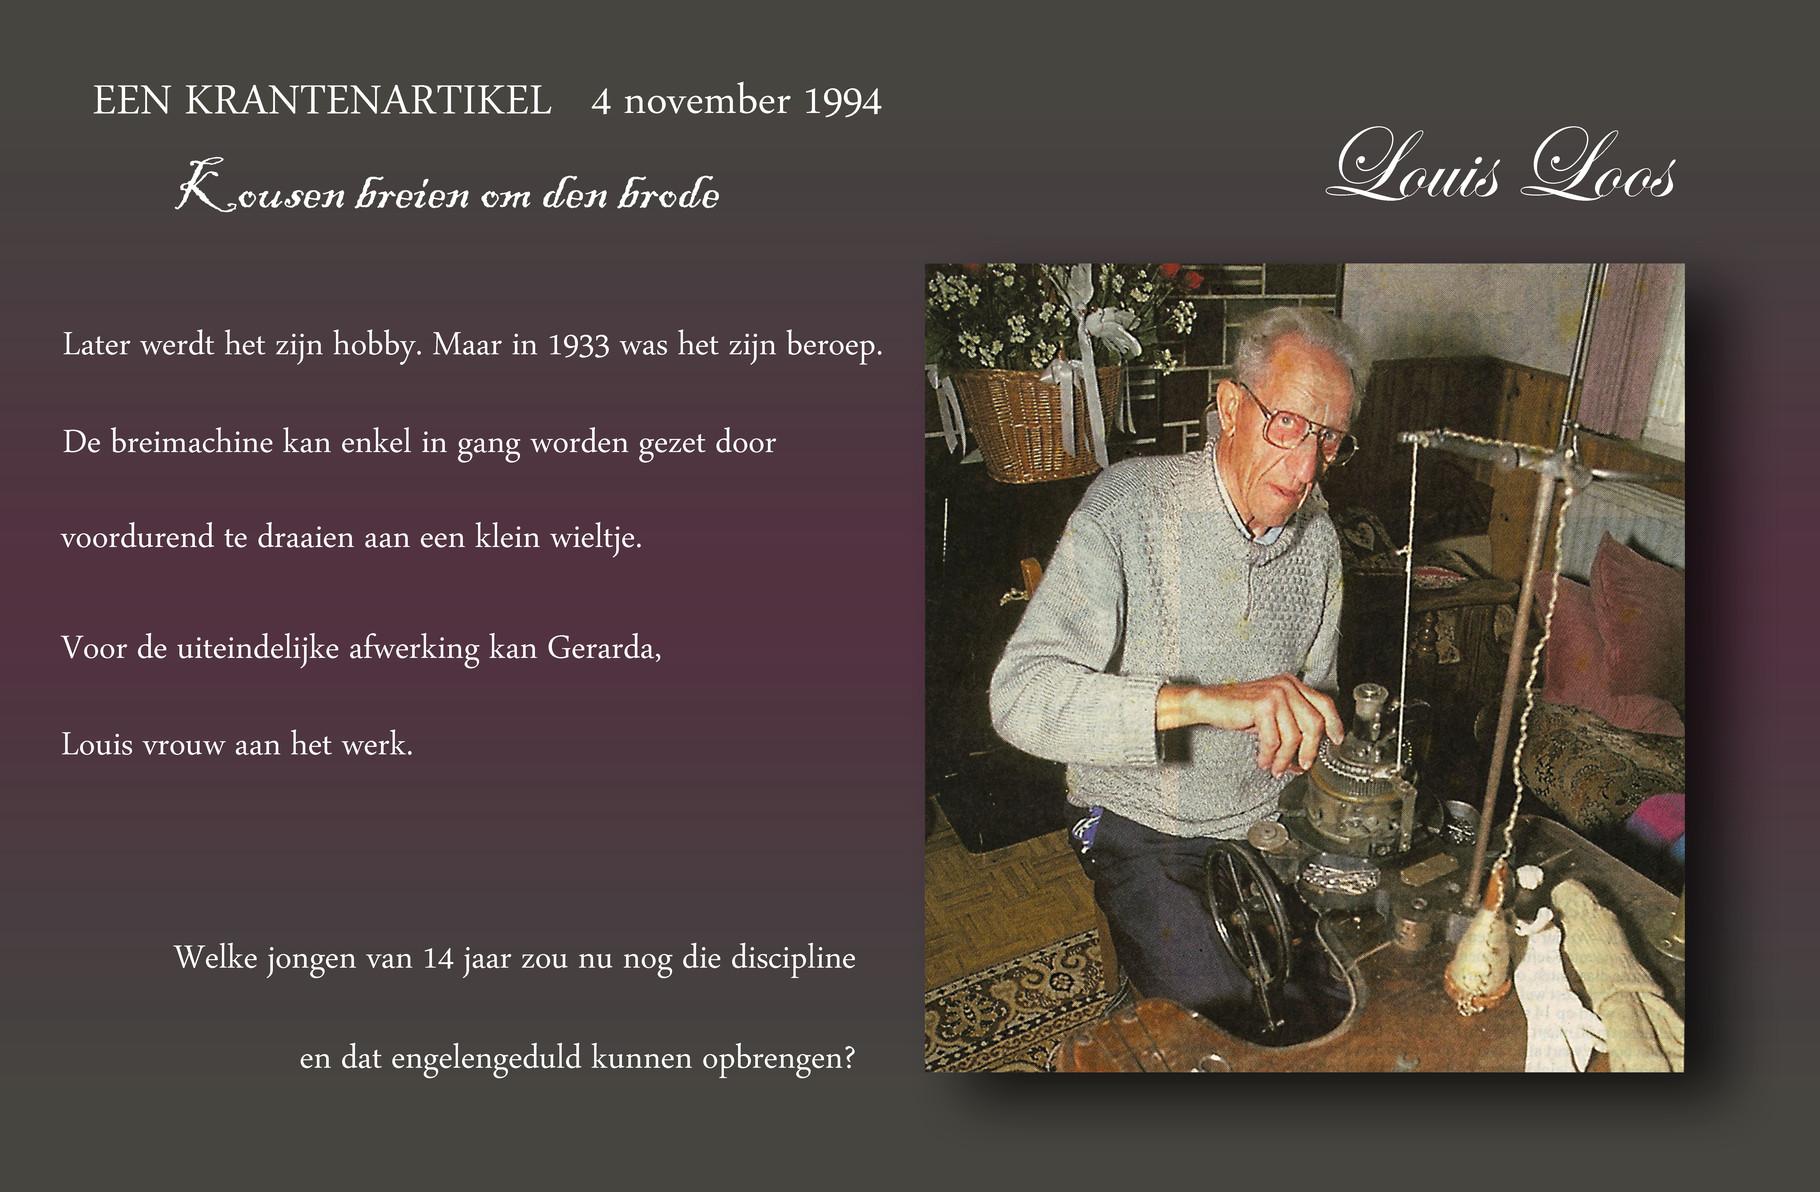 Louis Loos als kousenmaker